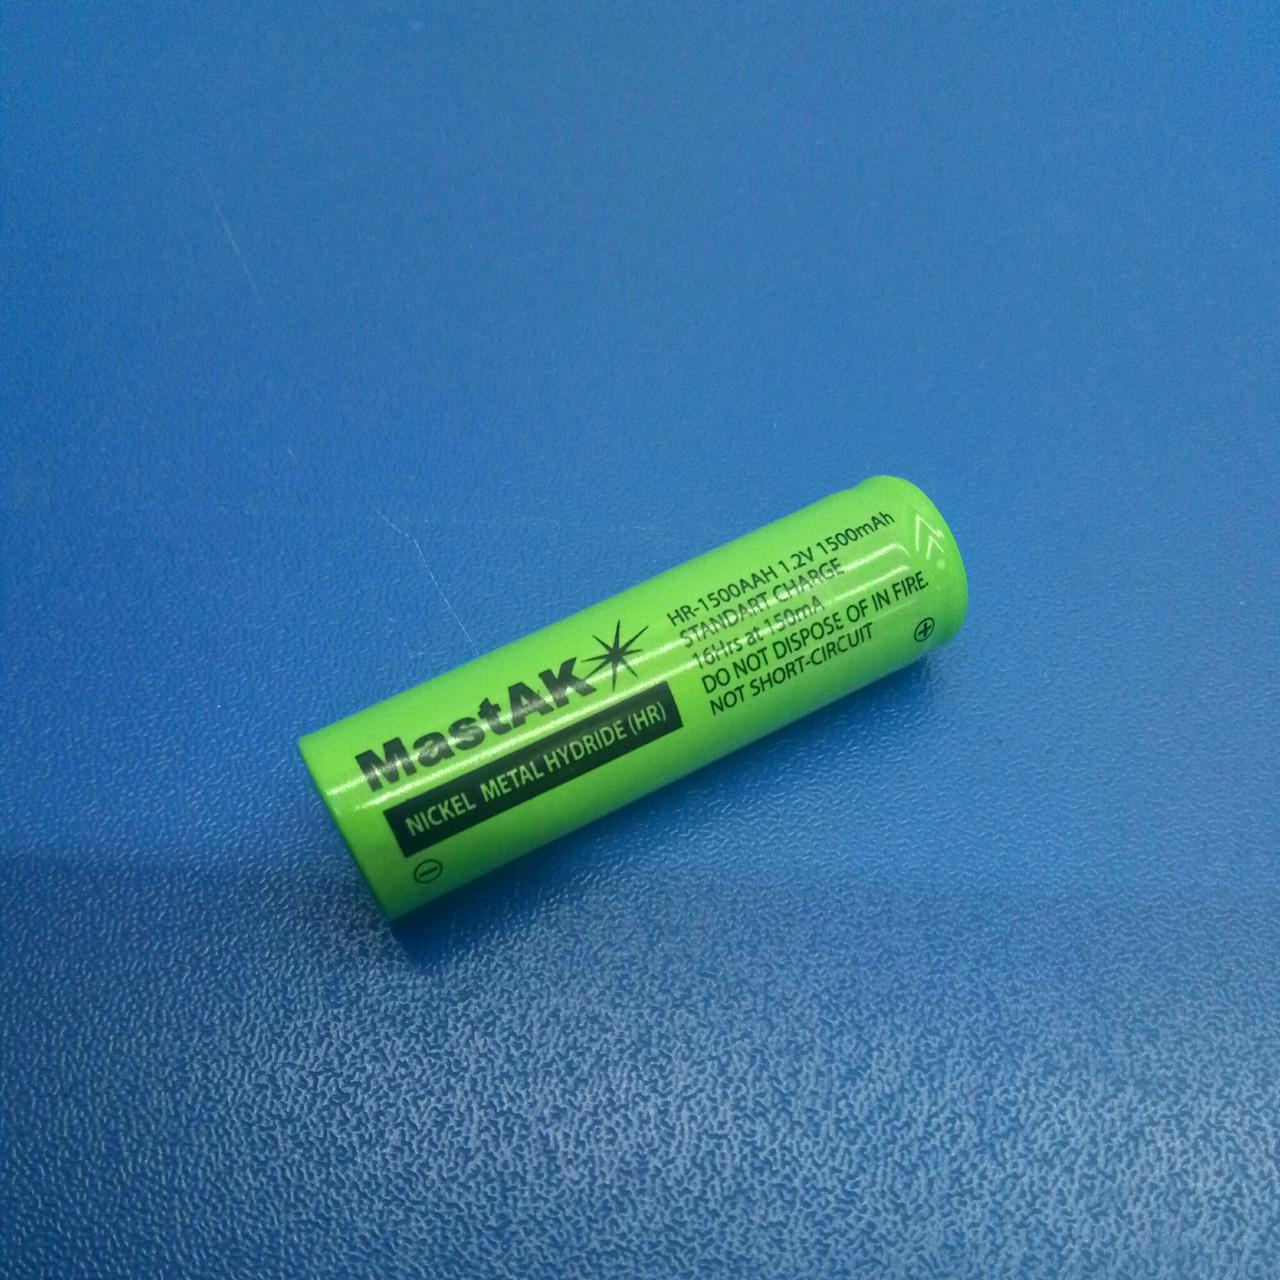 Аккумулятор технический MastAK HR-1500 AAH ( 1,2V 1,5Ah MH )